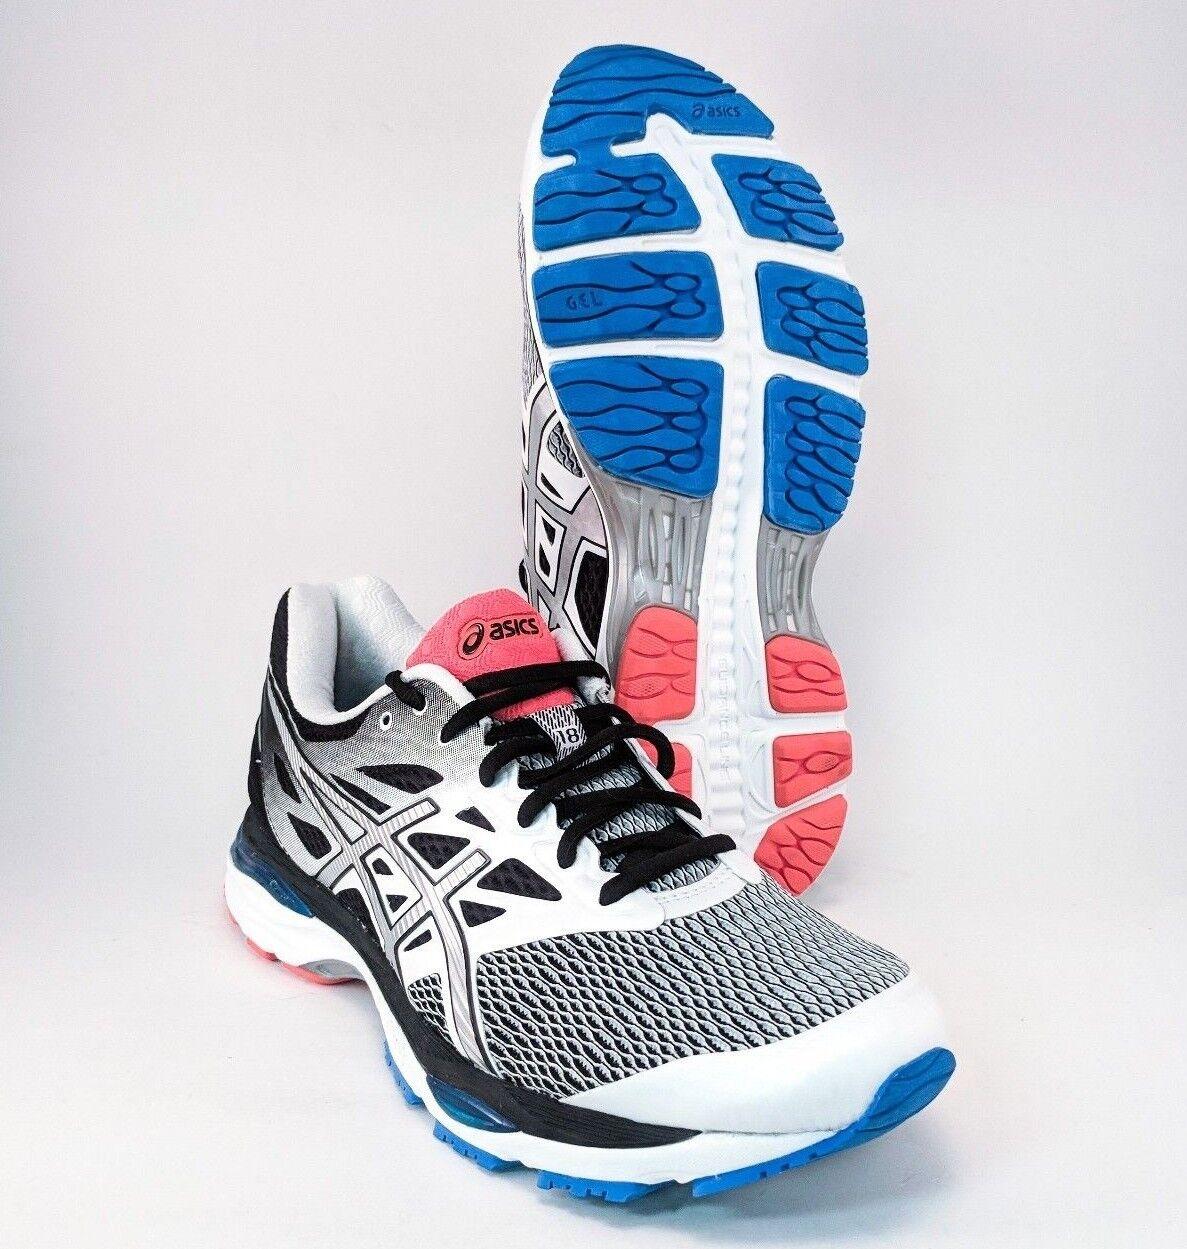 Asics Gel-Cumulus 18 Black Blue Pink Running Mens Size 7.5 T6C3N FREE PRIORITY